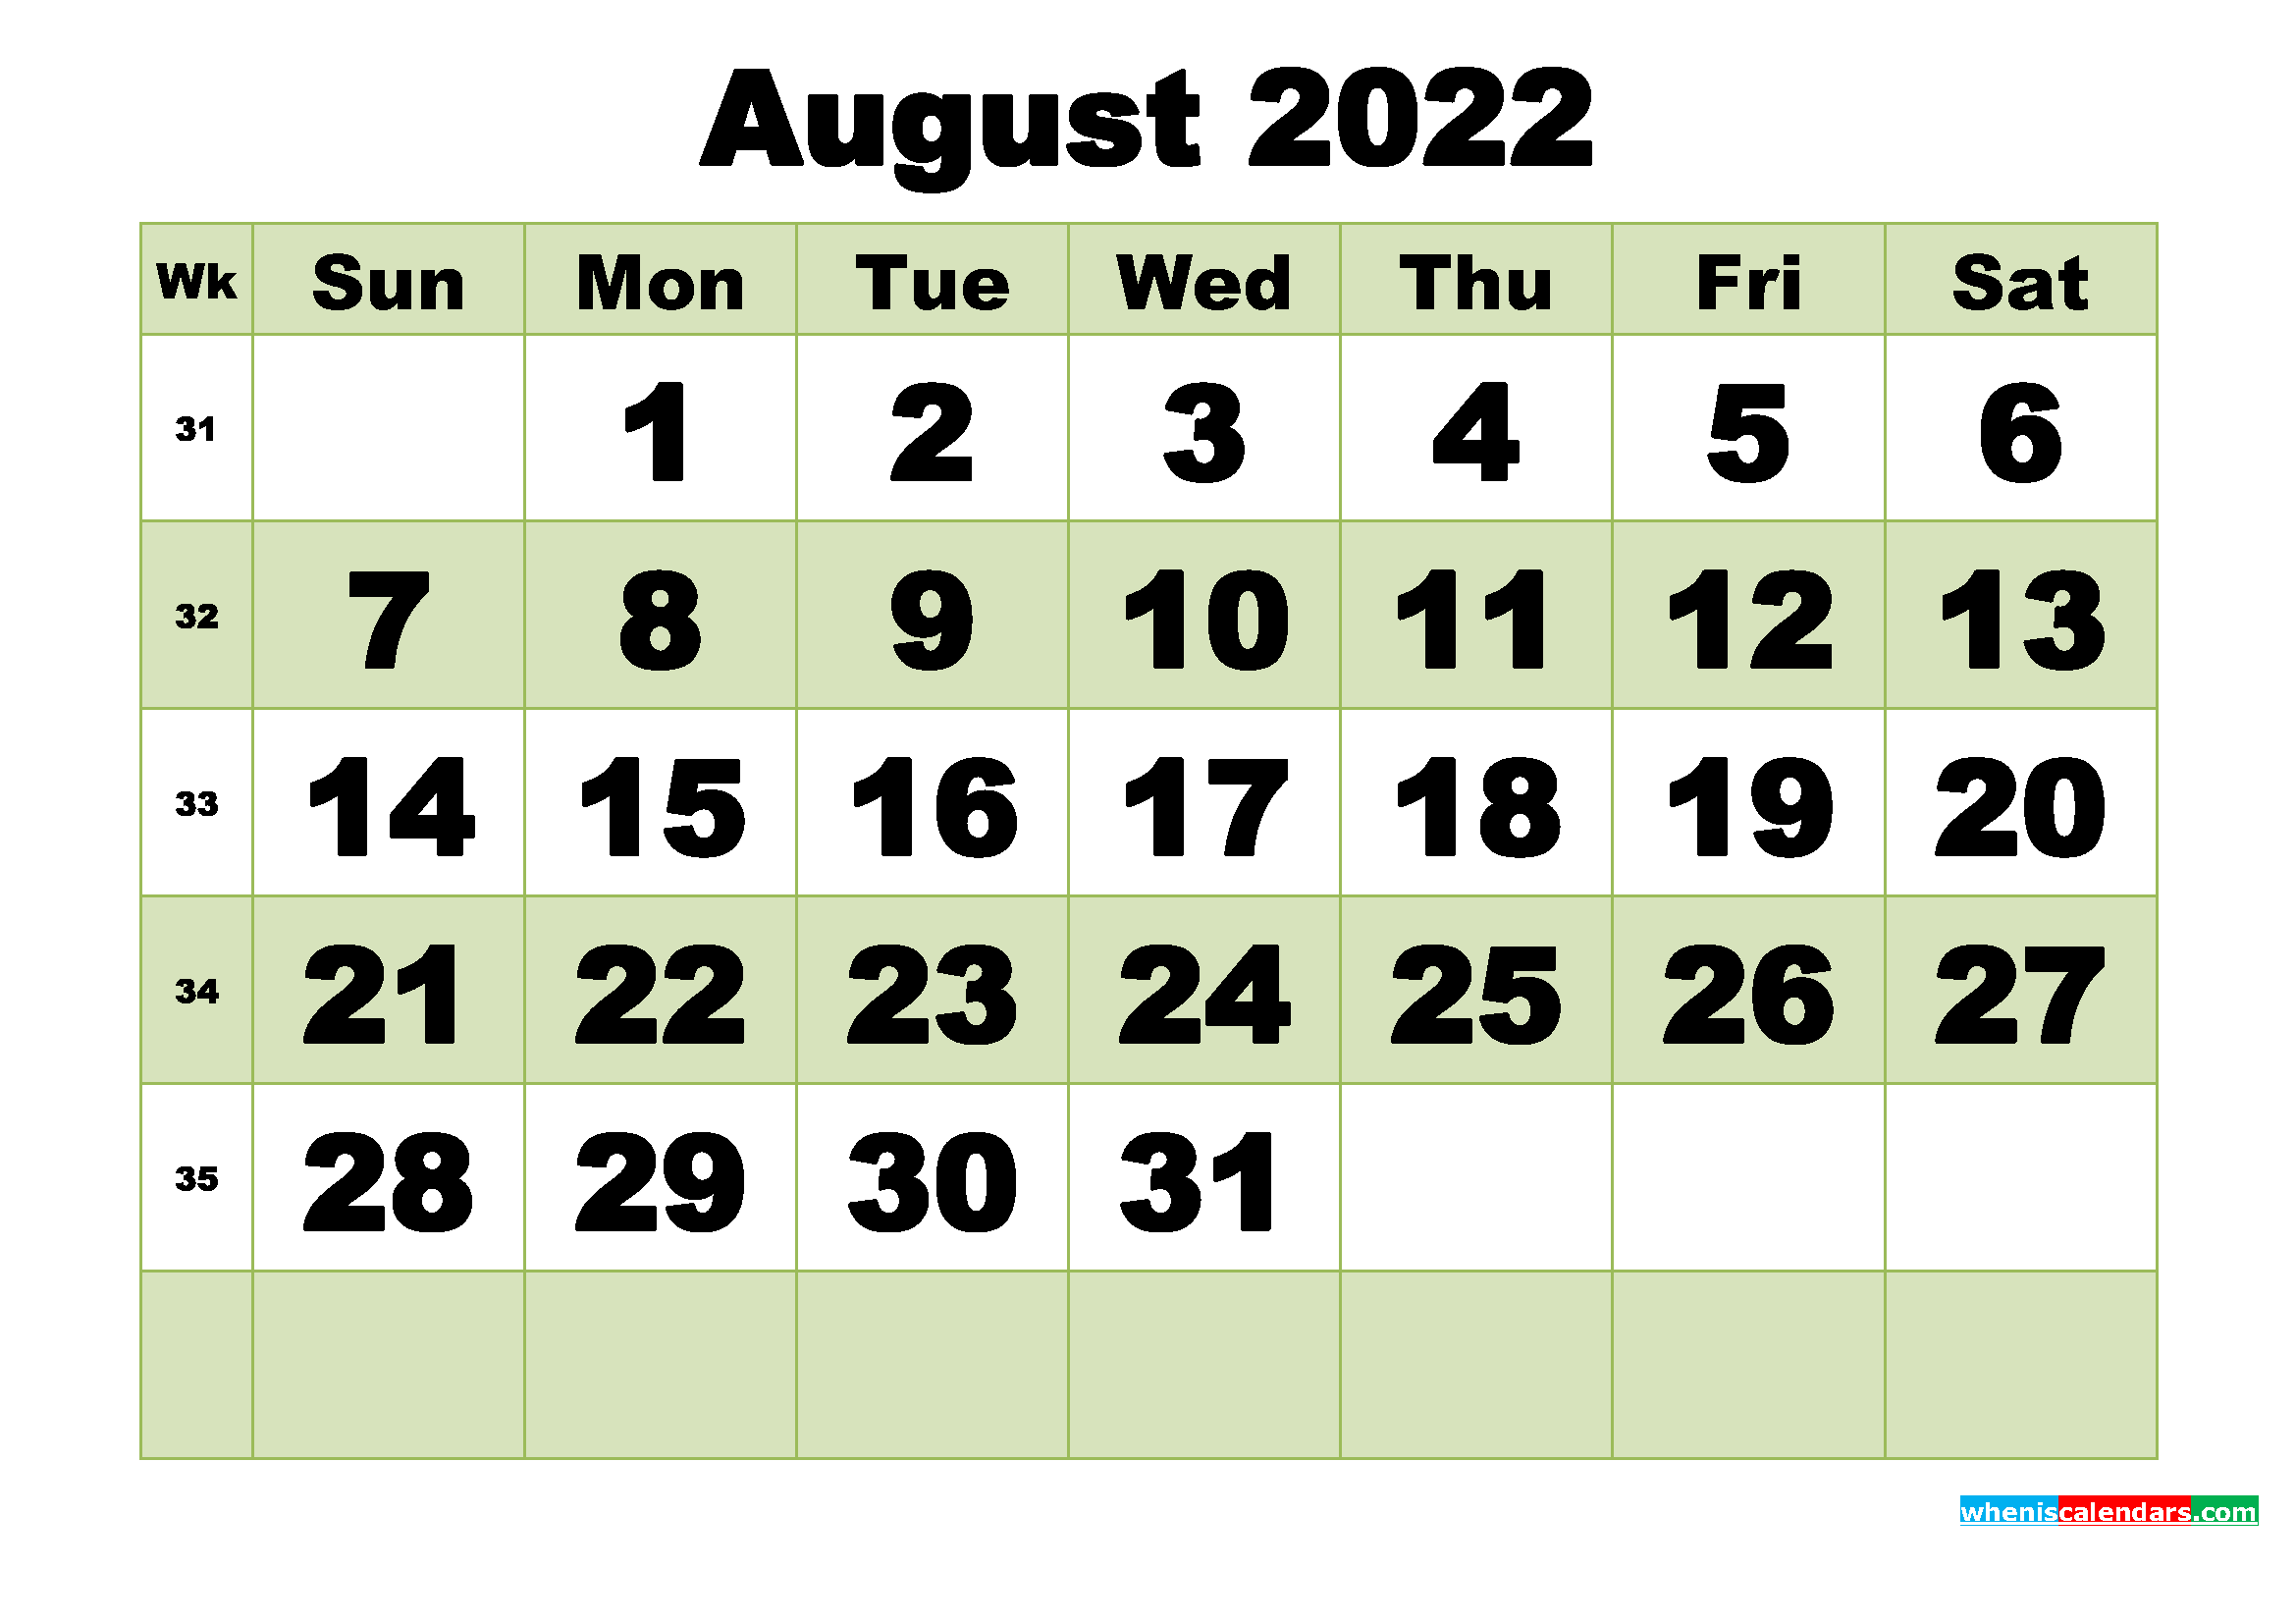 August 2022 Printable Calendar Template